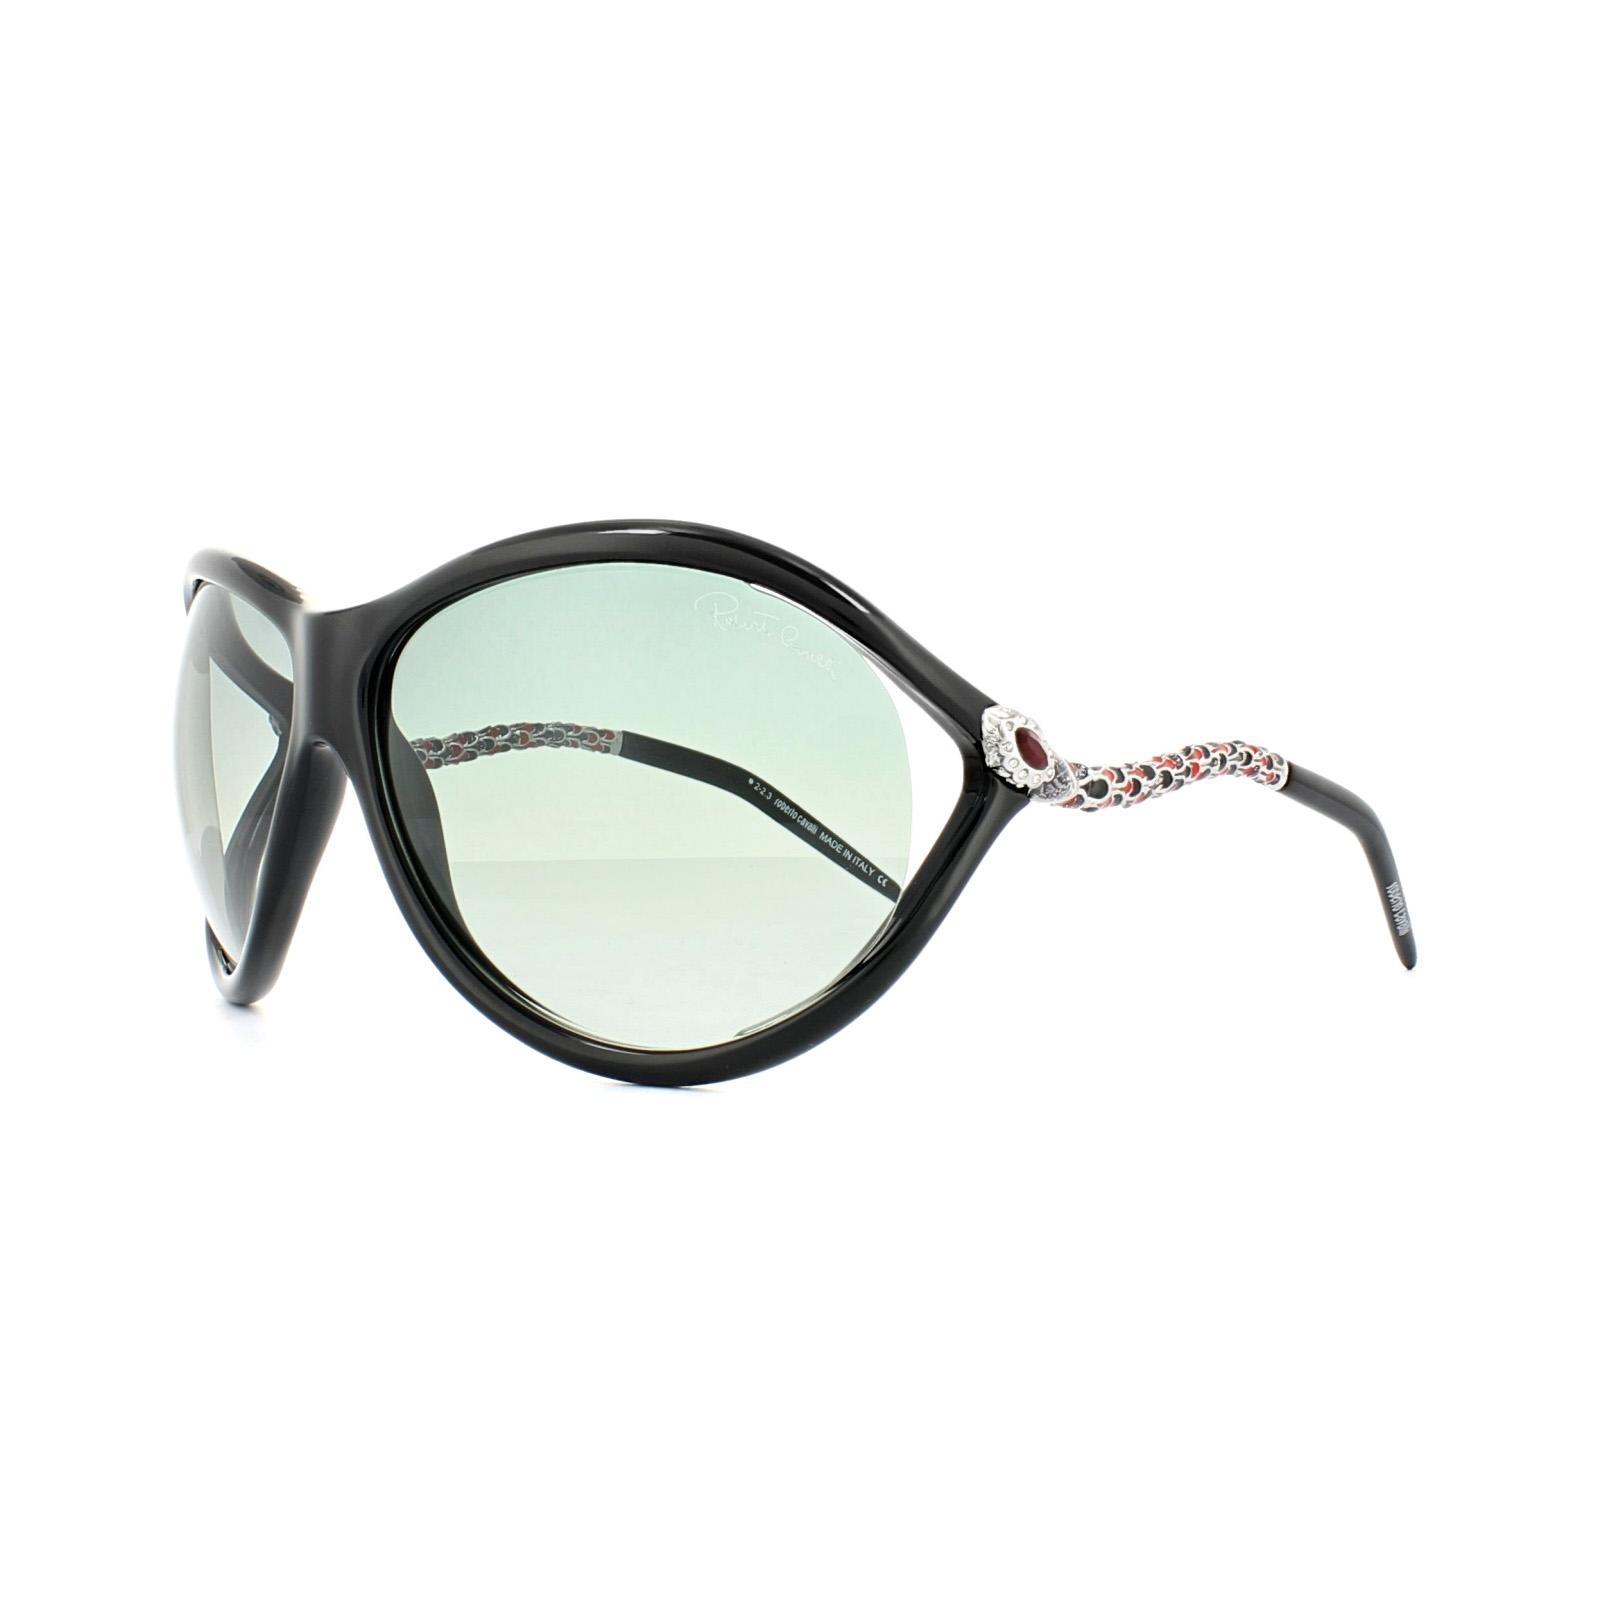 9c815e82b8789 Sentinel Roberto Cavalli Sunglasses Caph 853S 01B Shiny Black Grey Gradient